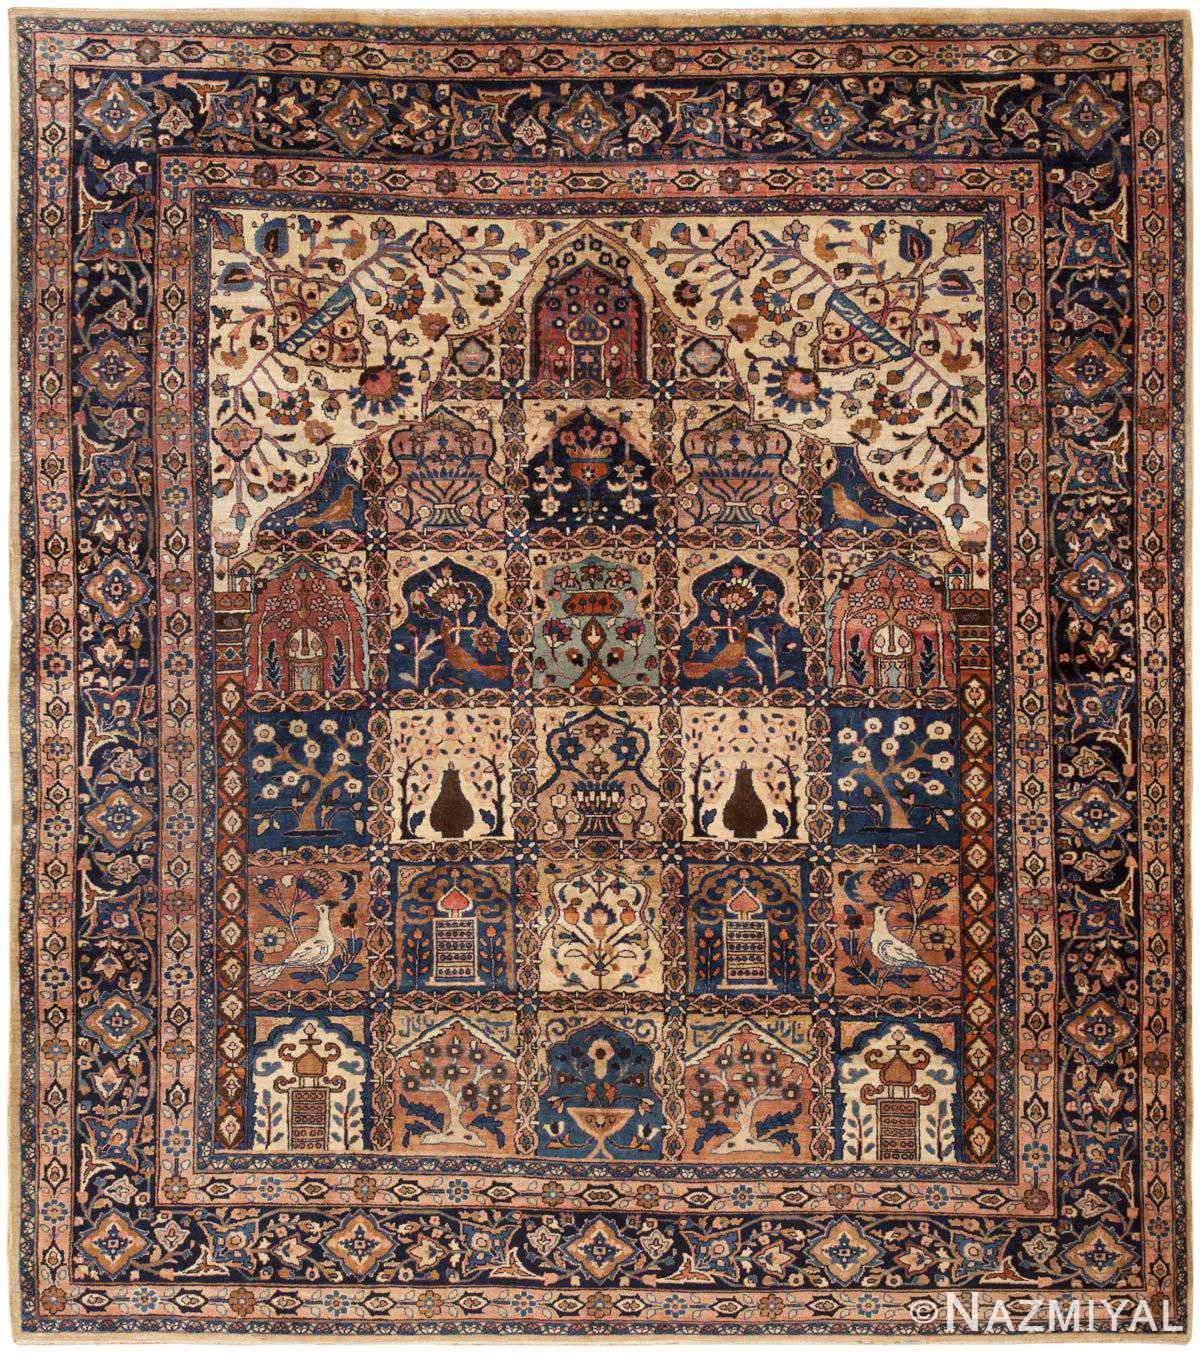 Vintage Persian Rugs: Antique Persian Carpet